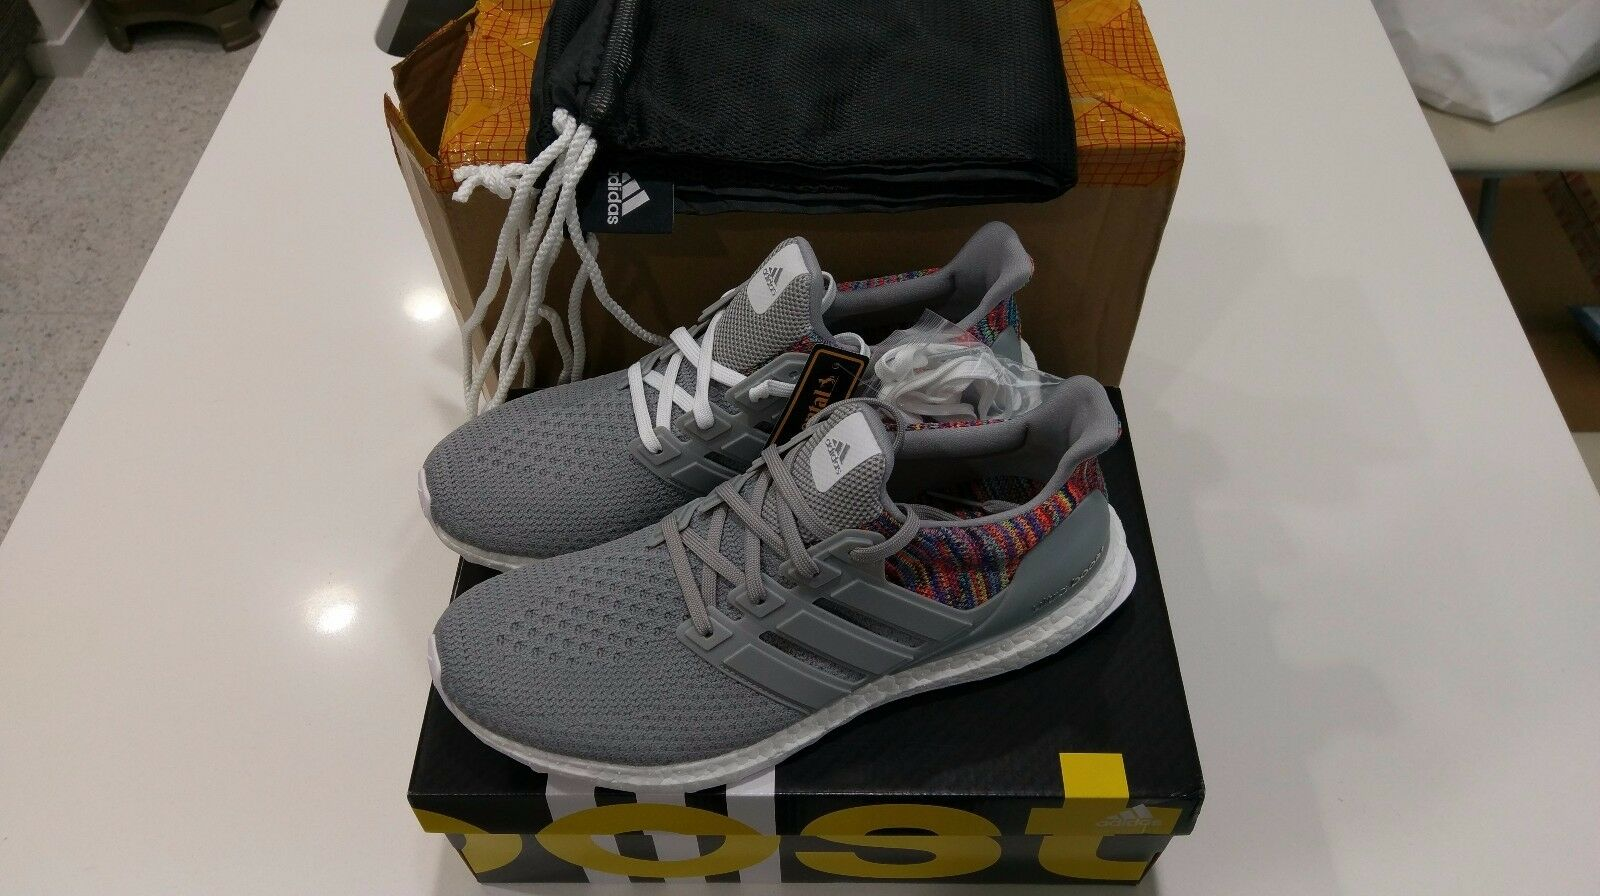 NEW Adidas MiAdidas Rainbow grigio Ultra BOOST Dimensione 10 MultiColoreee Deadstock RARE